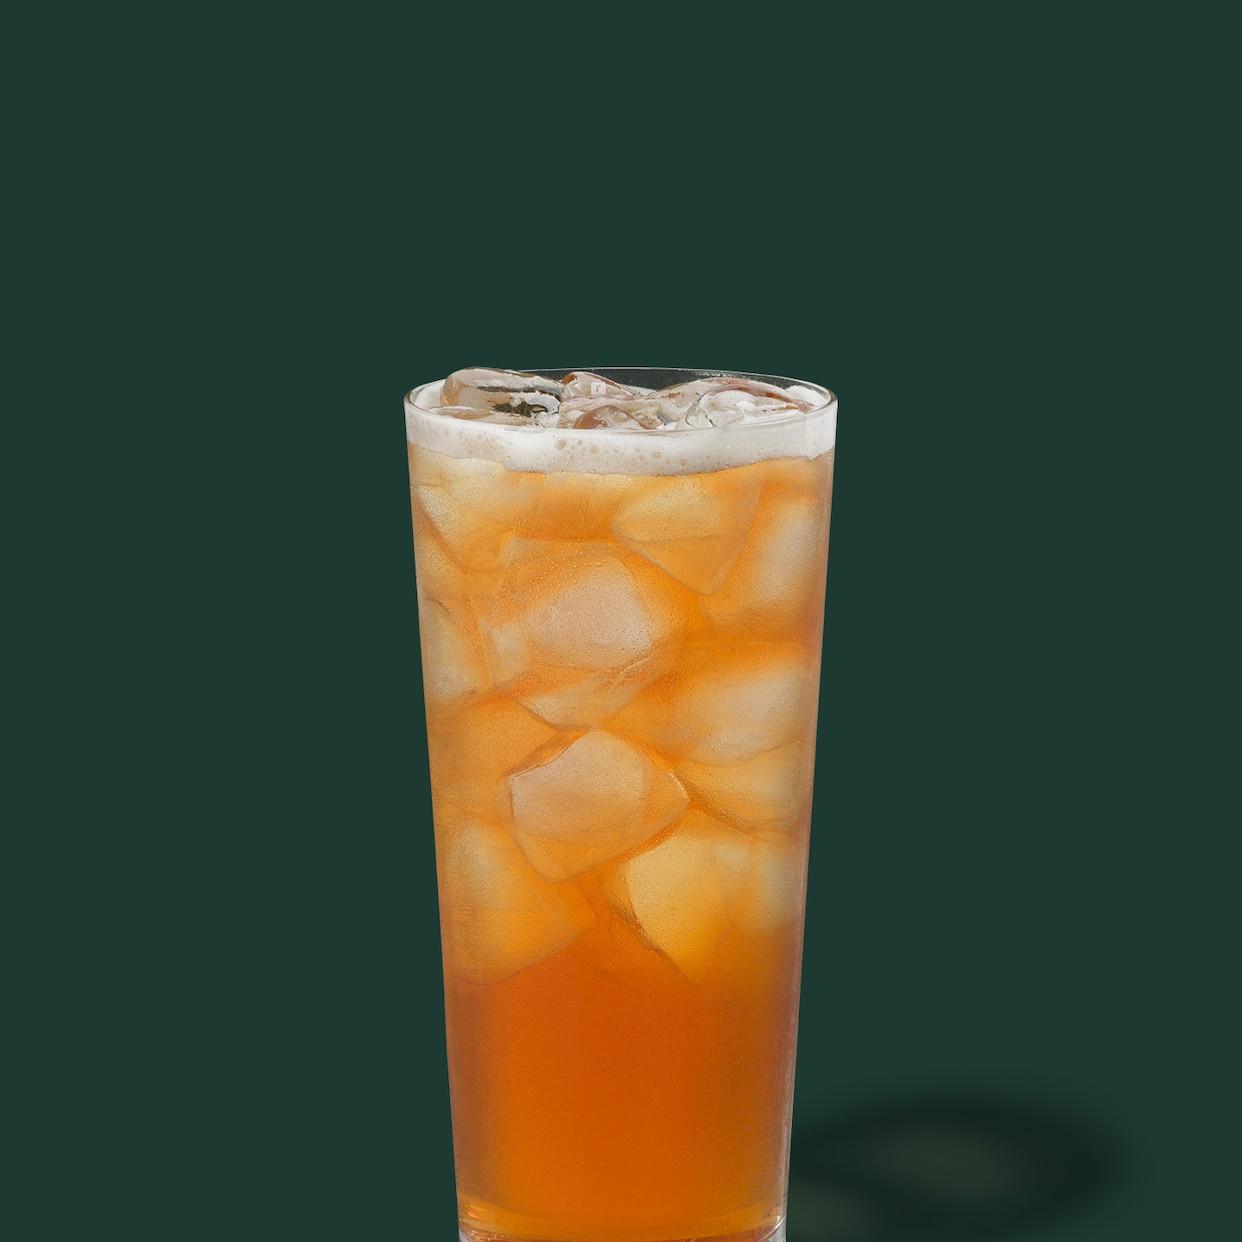 Iced Black Tea: Starbucks Coffee Company